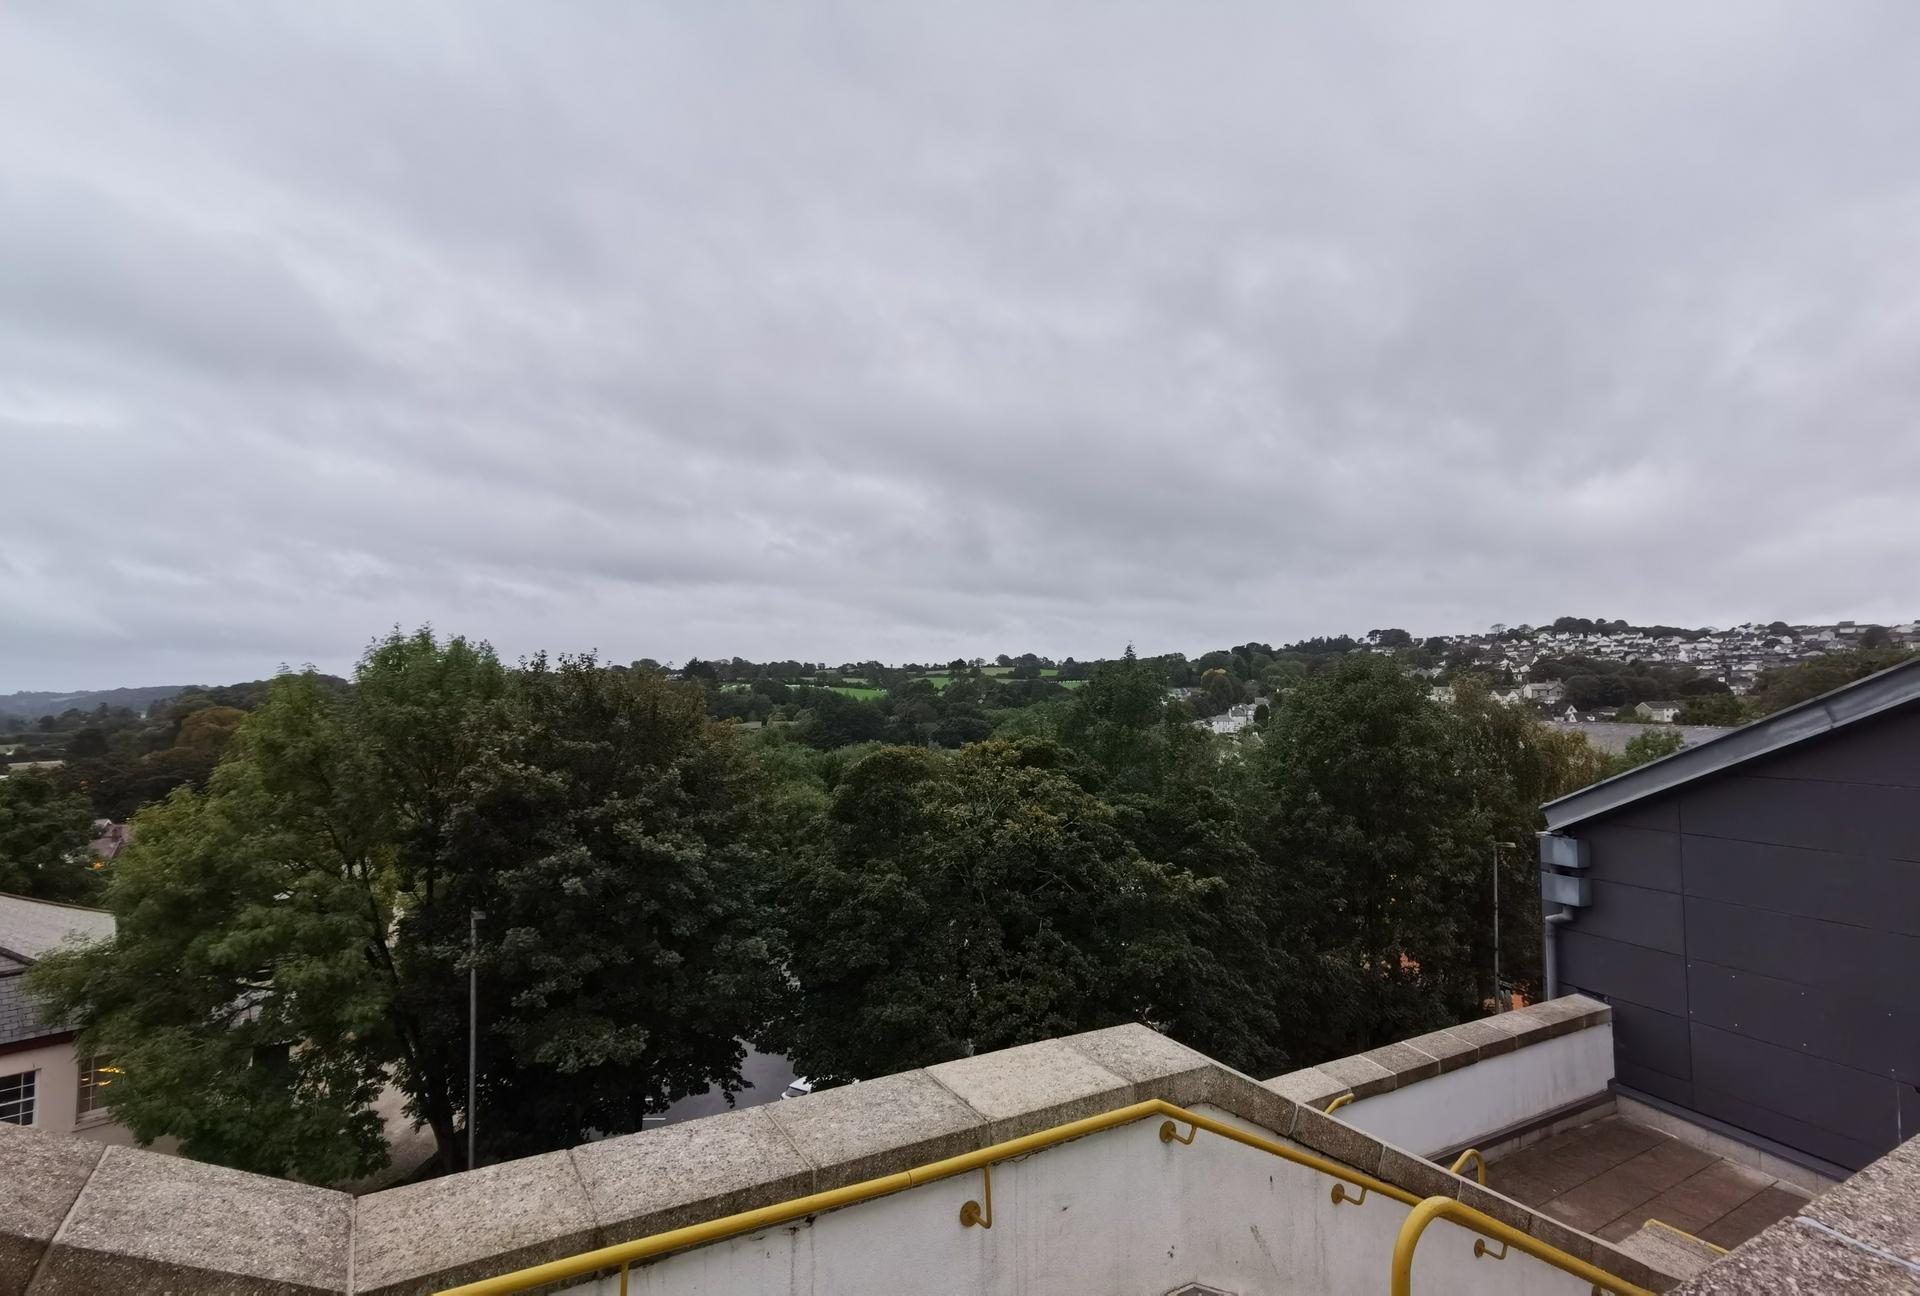 Huawei Mate 30 Pro Camera test HDR shot overlooking dark trees